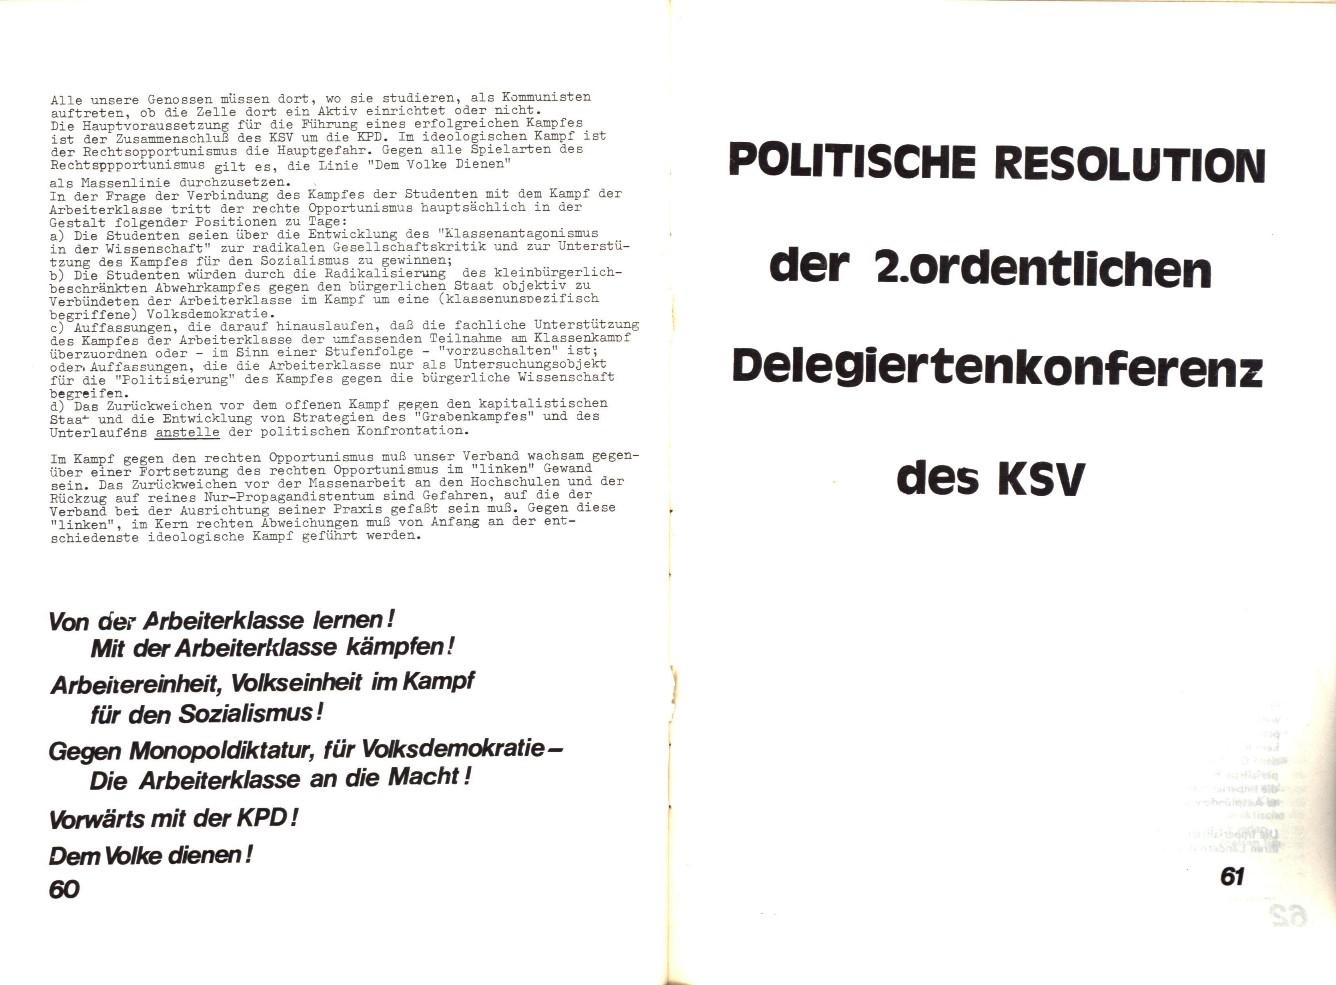 KSV_1974_Rechenschaftsbericht_32